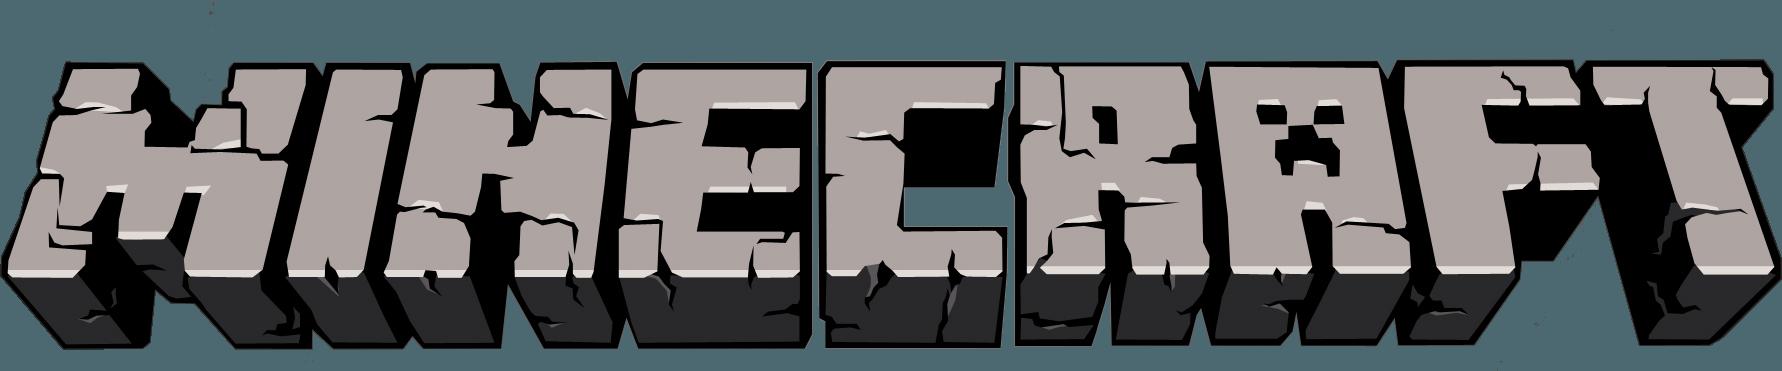 Minecraft pe logo clipart jpg free stock Minecraft Logo - LogoDix jpg free stock